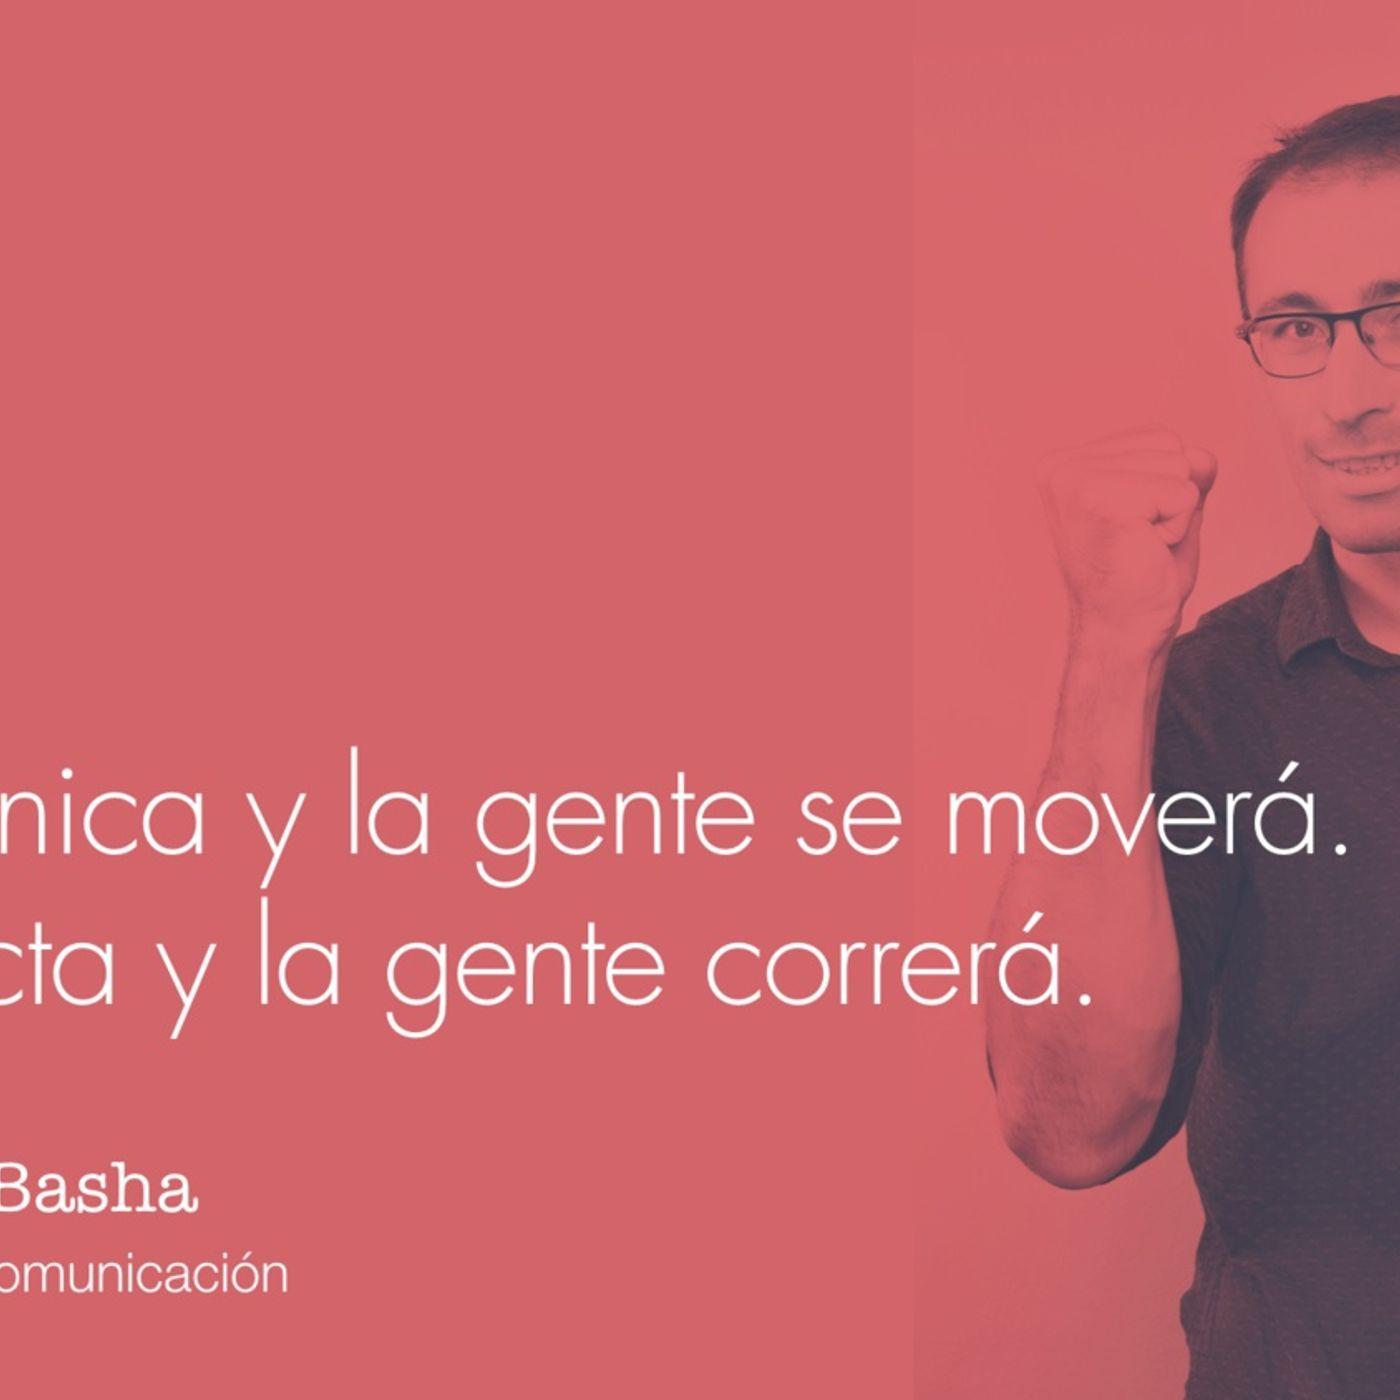 Mejora tu comunicación. James Basha